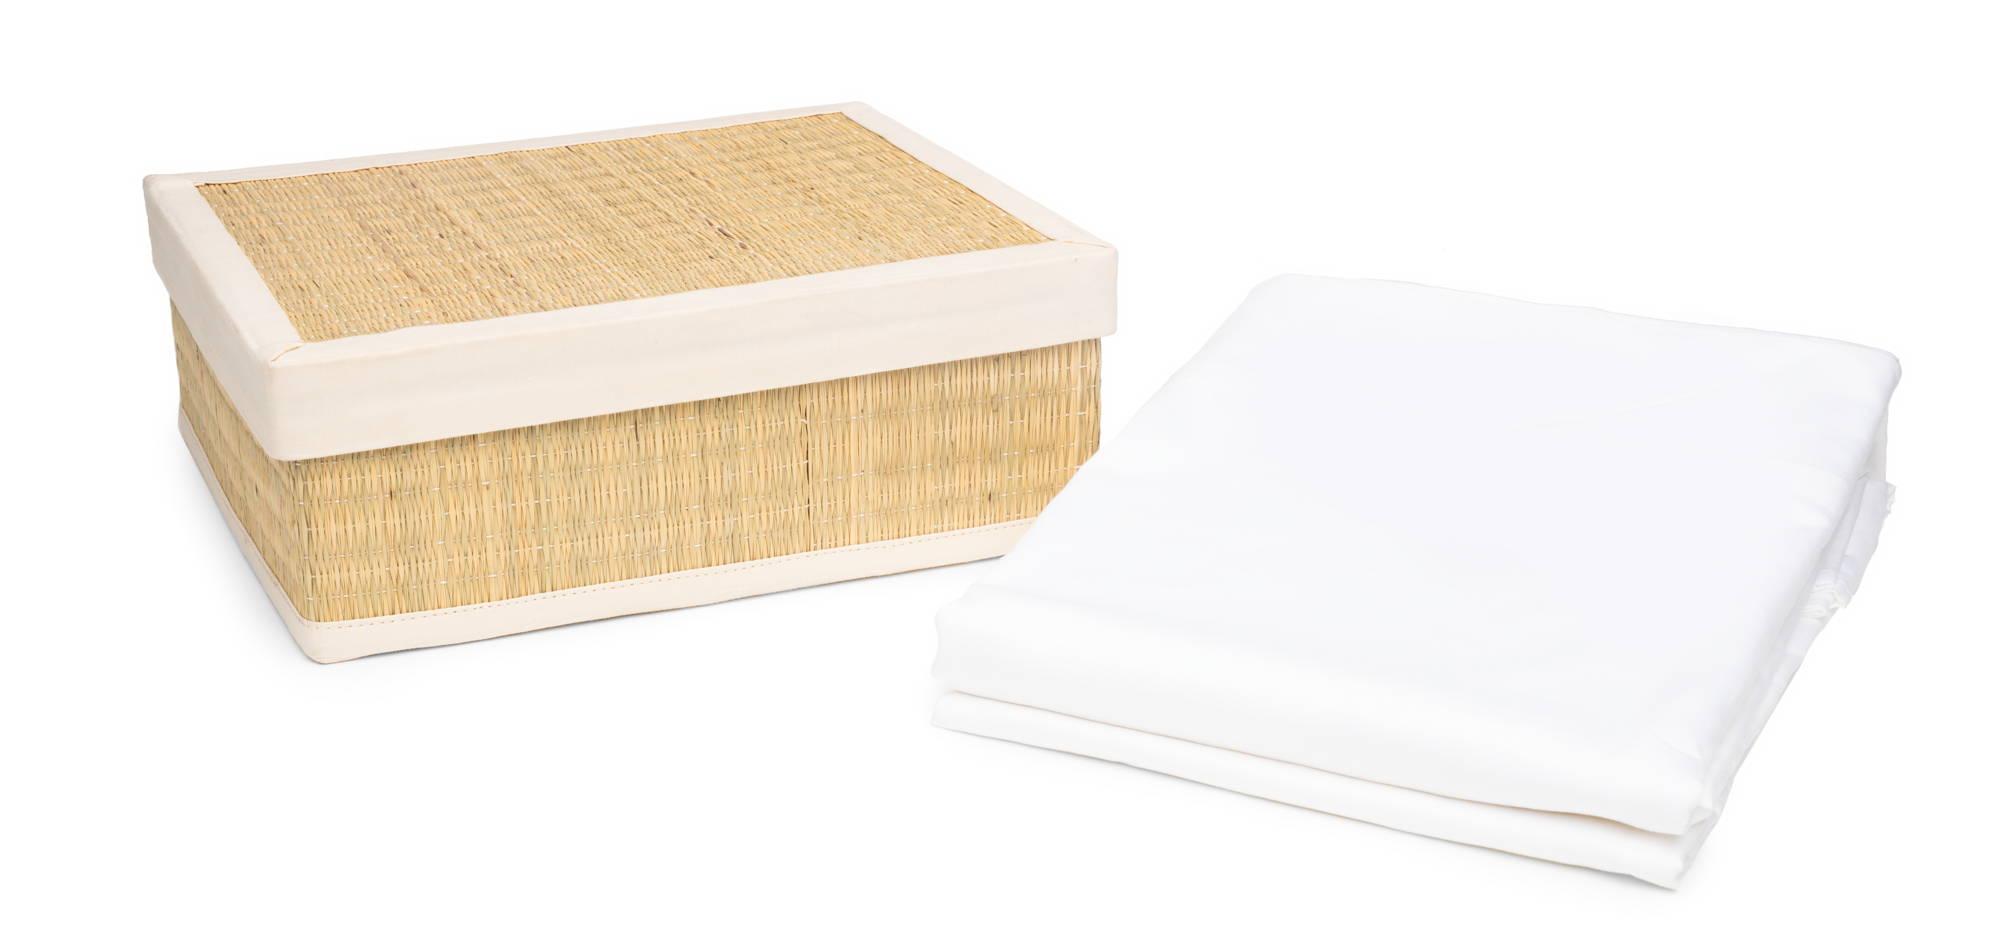 DOPLNOK-Organic-Cotton-Bed-Sheets-Gift-Box